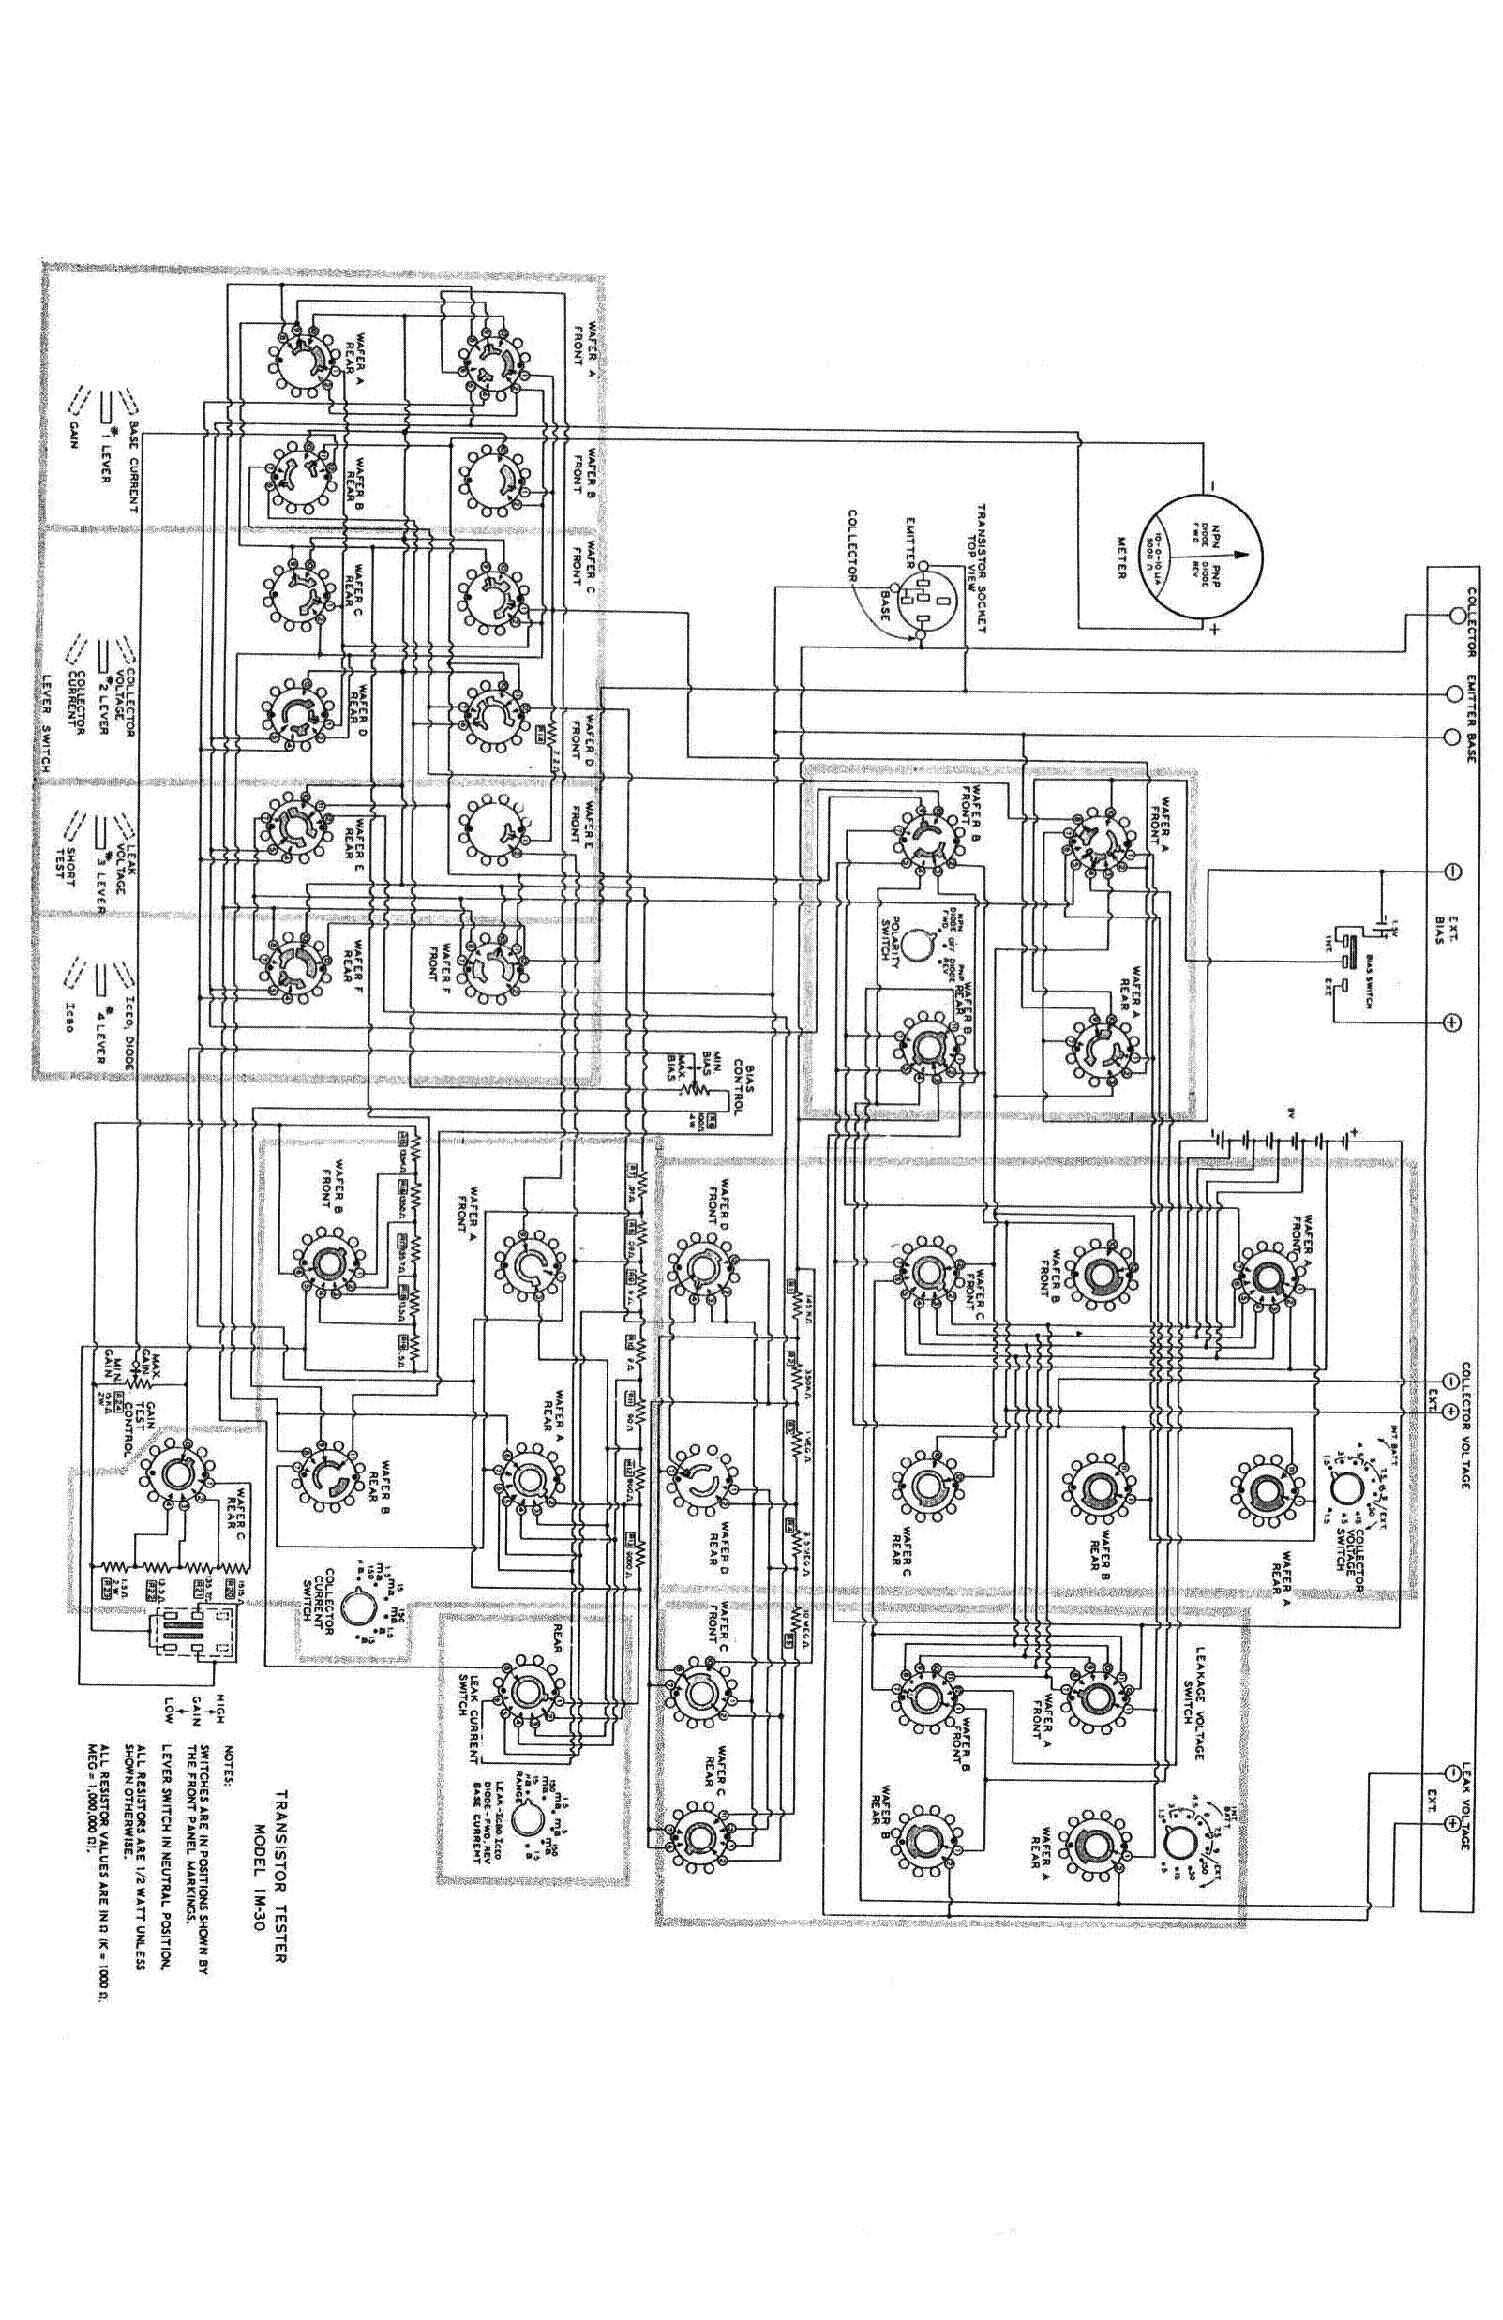 heathkit schematics and manuals free pdf radio shack manuals pdf